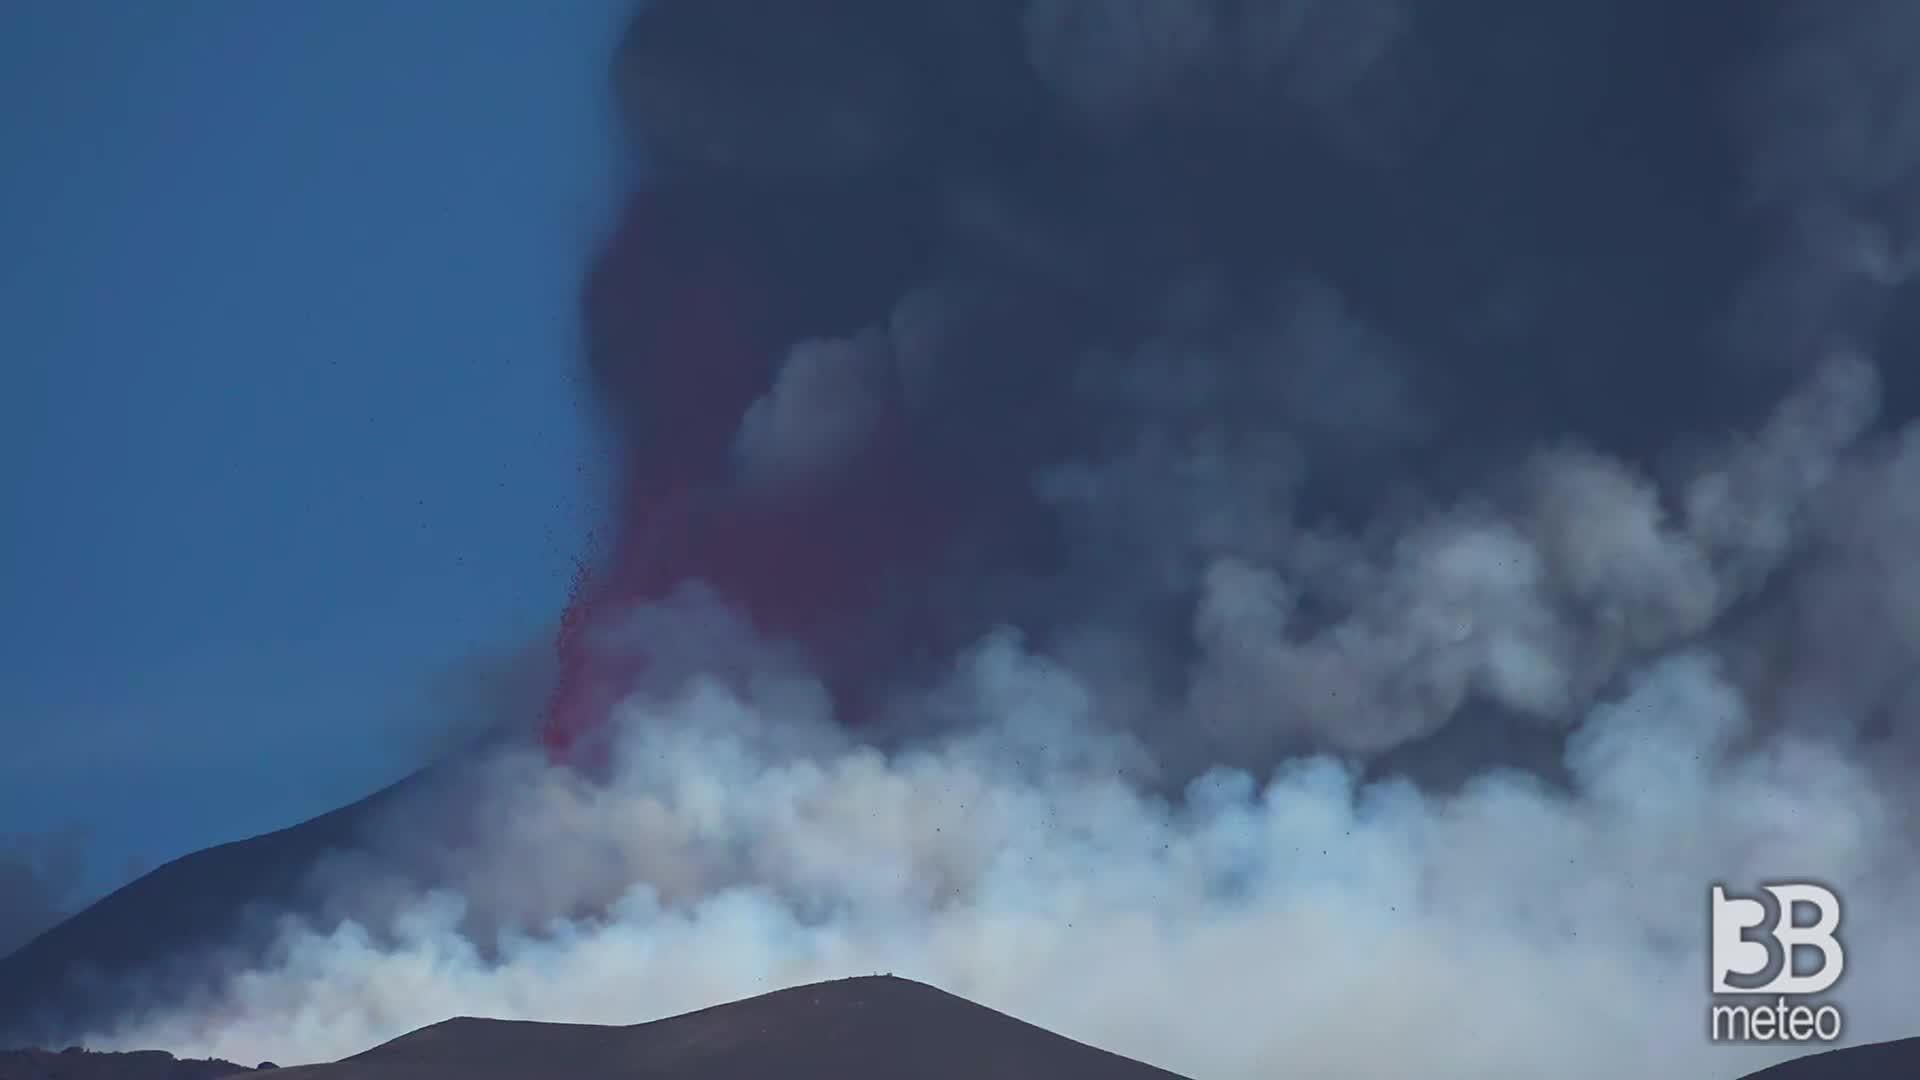 CRONACA DIRETTA - Etna, alta nube eruttiva: attività dal cratere di Sud Est - VIDEO